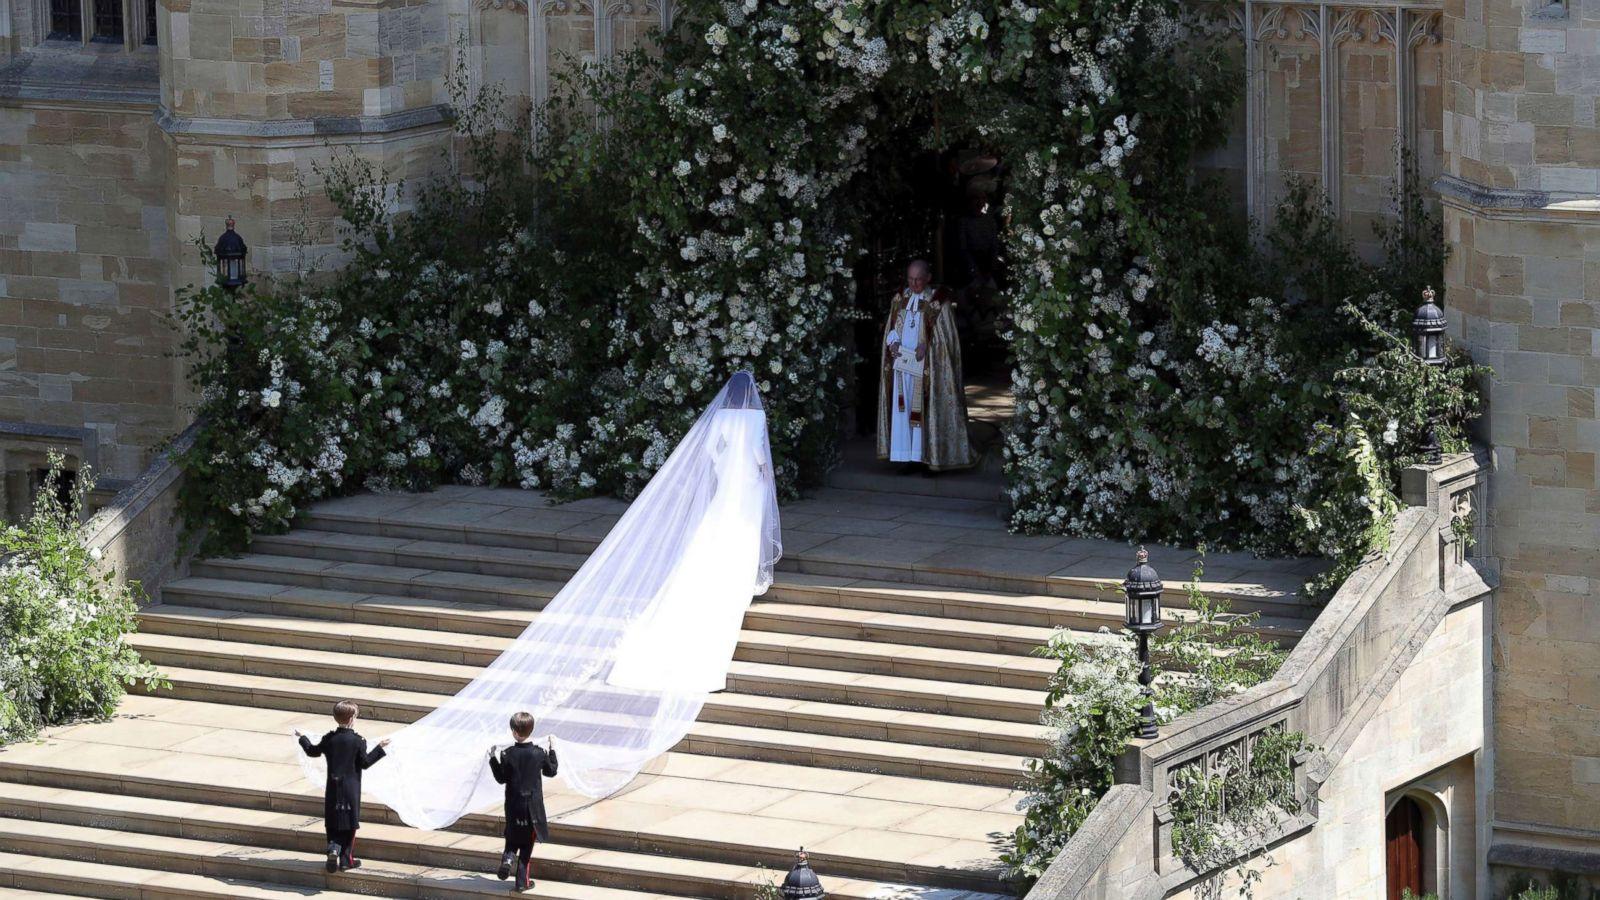 Royal Wedding Dress Meghan Markle.Royal Wedding 2018 All About Meghan Markle S Wedding Dress Gma